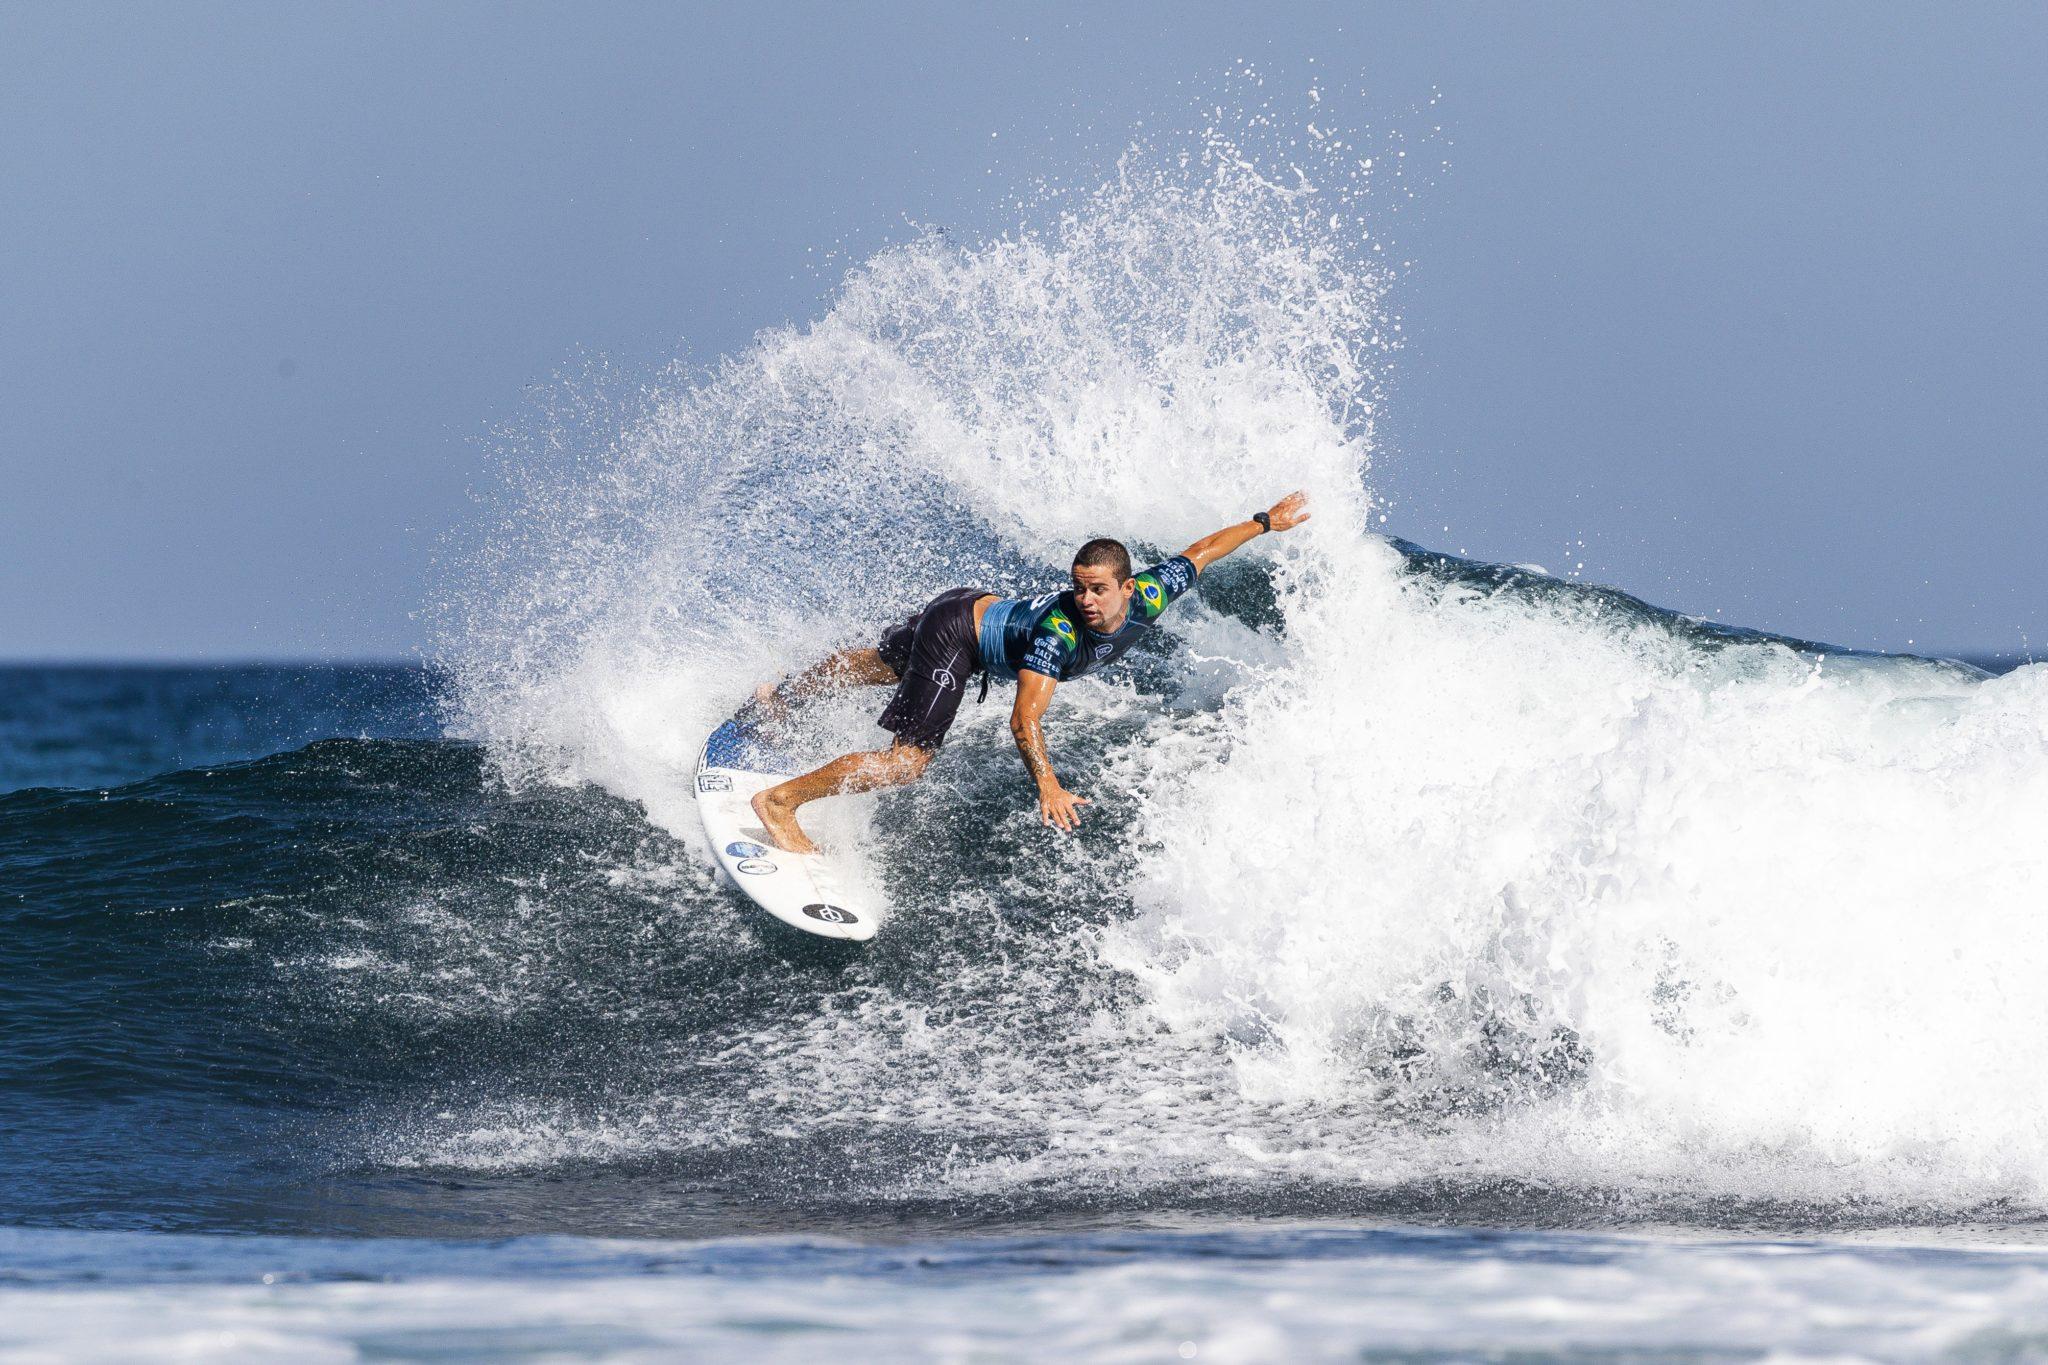 Deivid Silva (SP) (Matt Dunbar / WSL via Getty Images)